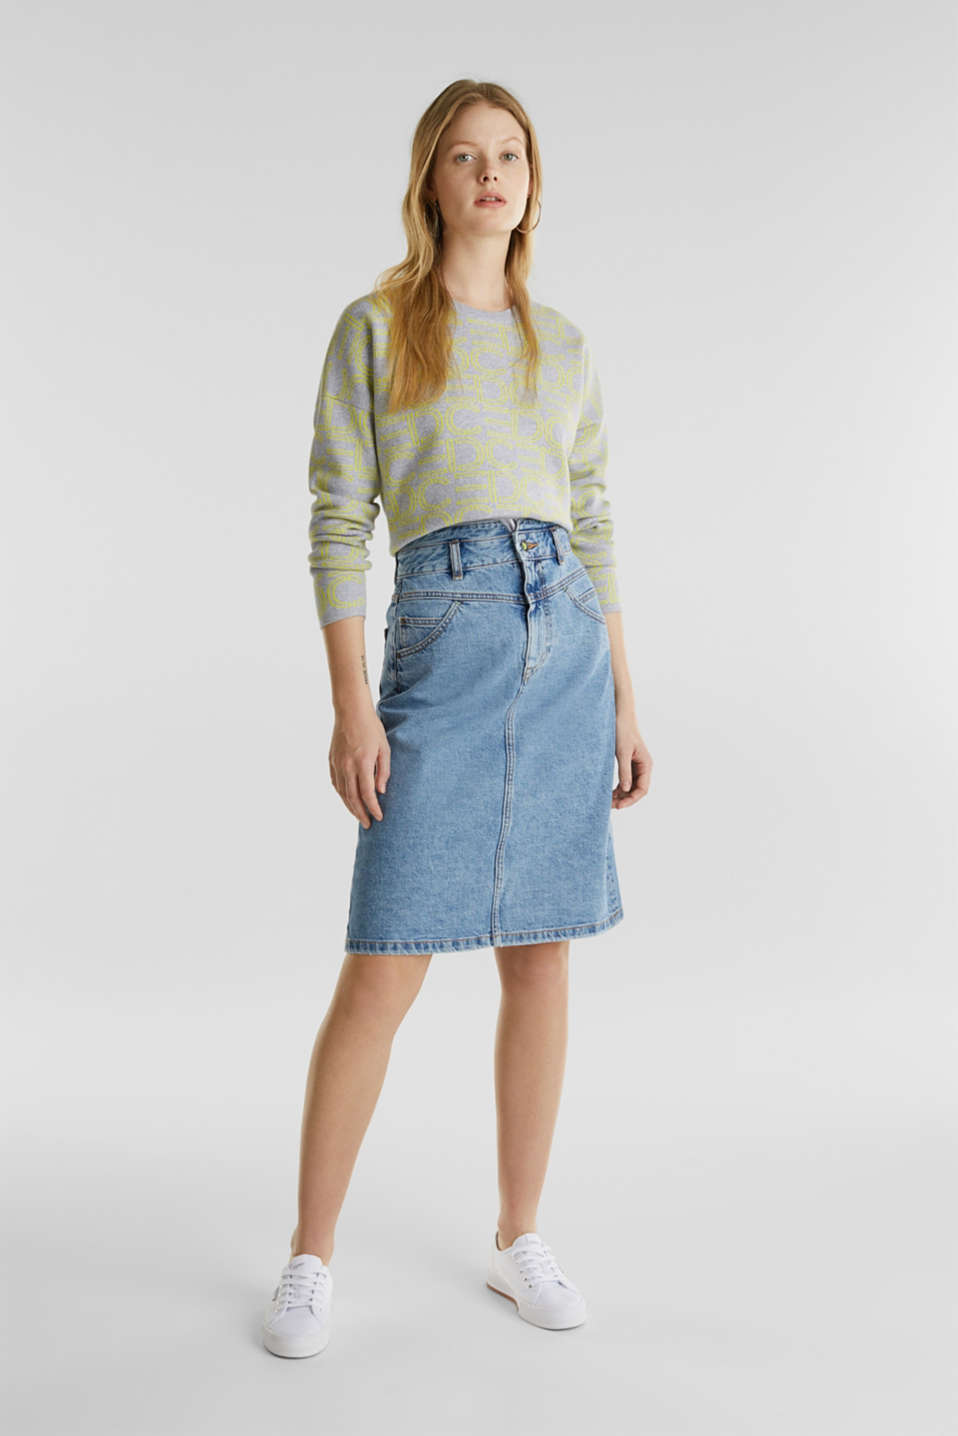 Denim skirt with neon details, BLUE MEDIUM WASH, detail image number 1